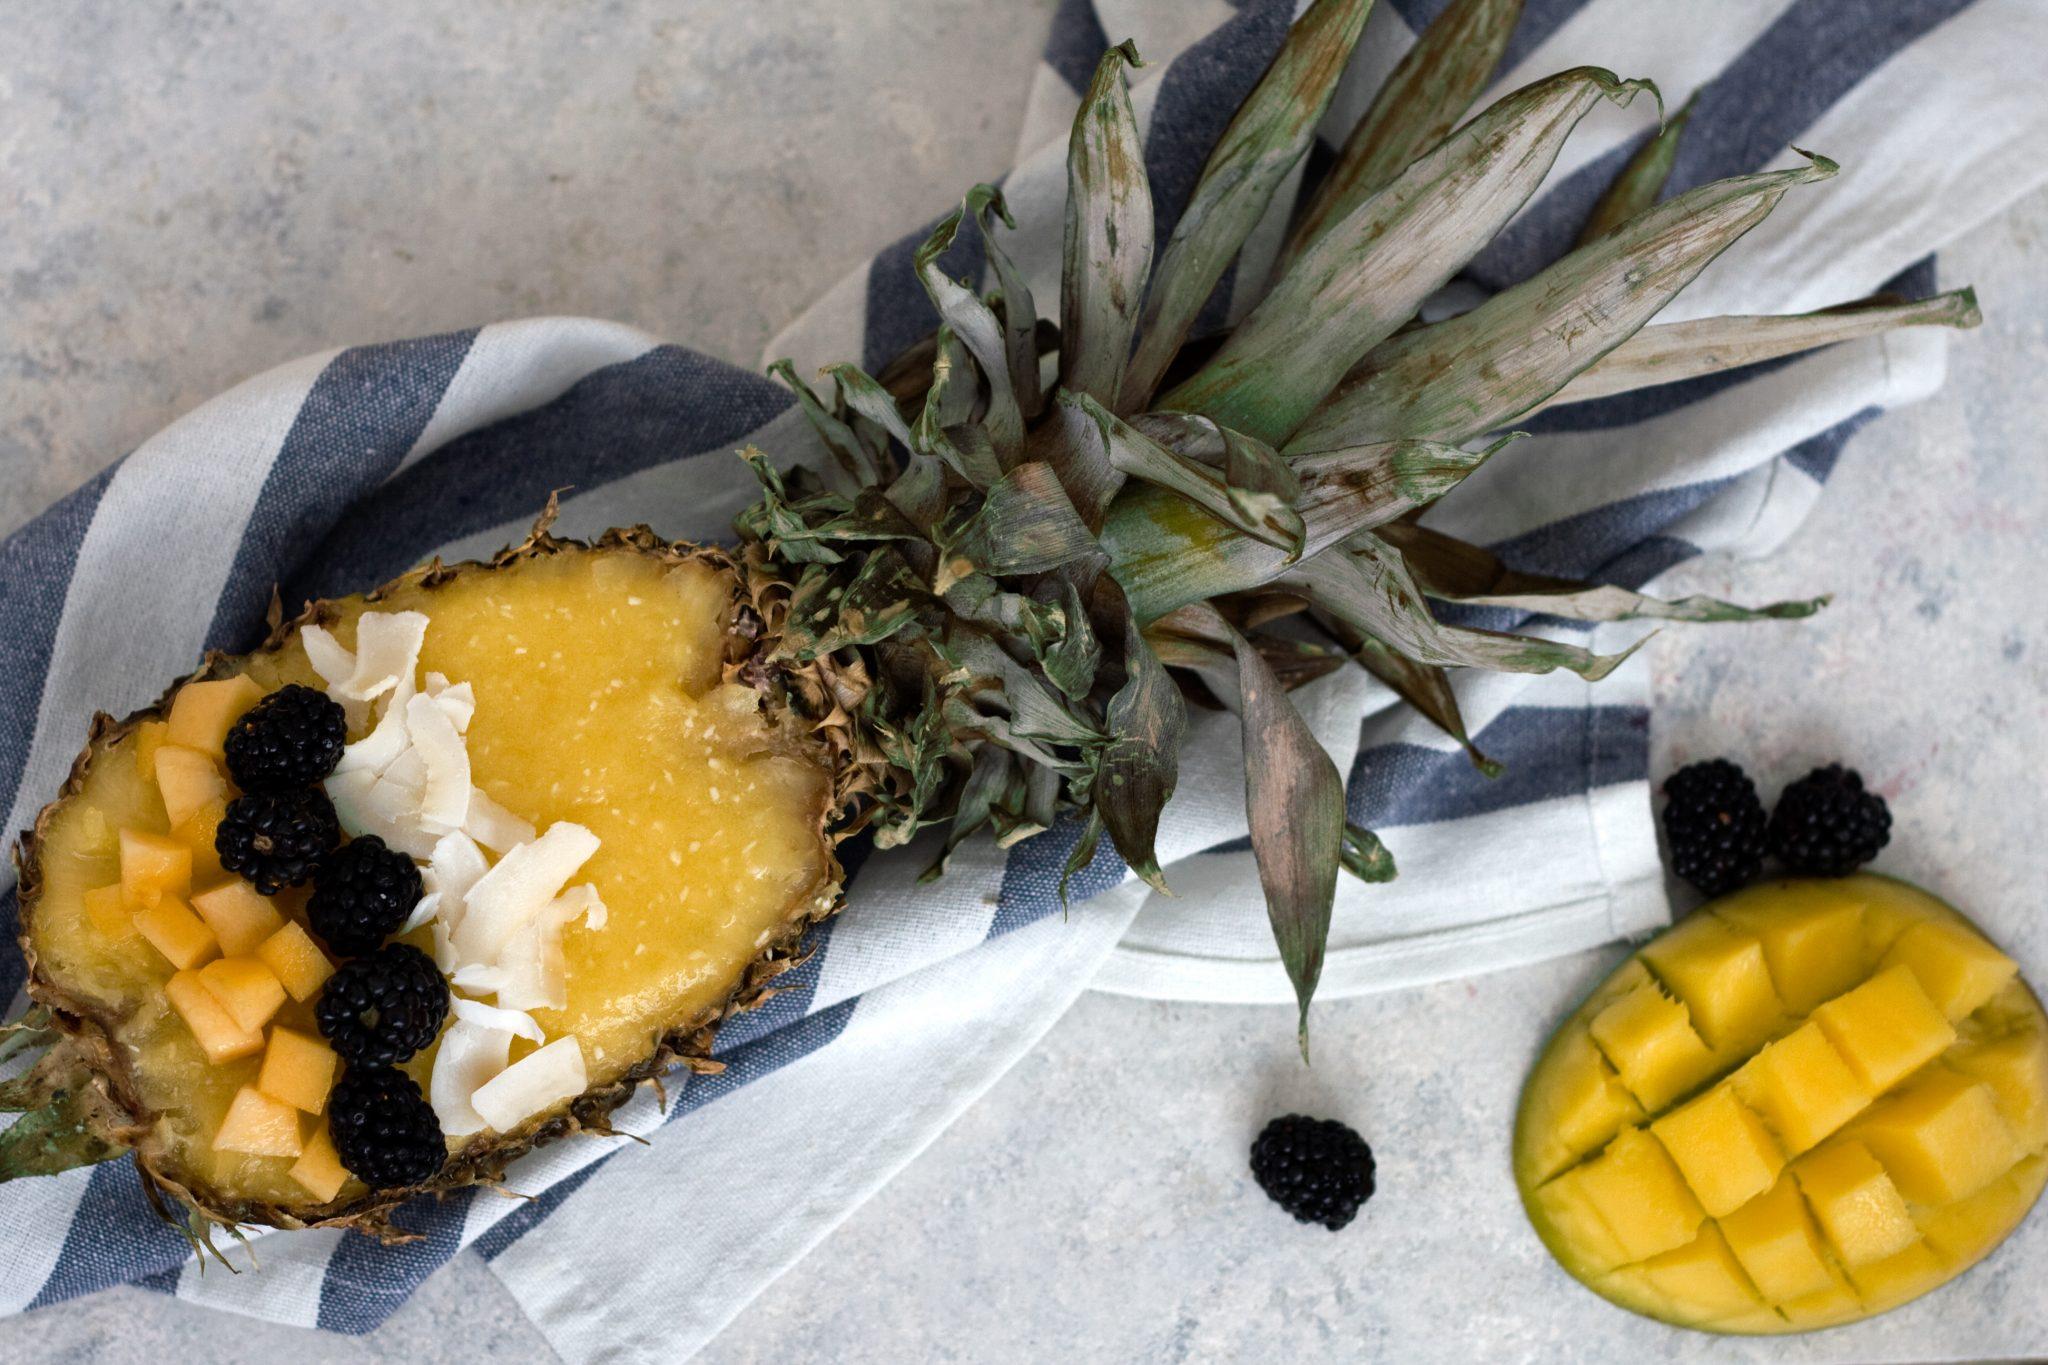 Tropical Piña Colada Smoothie